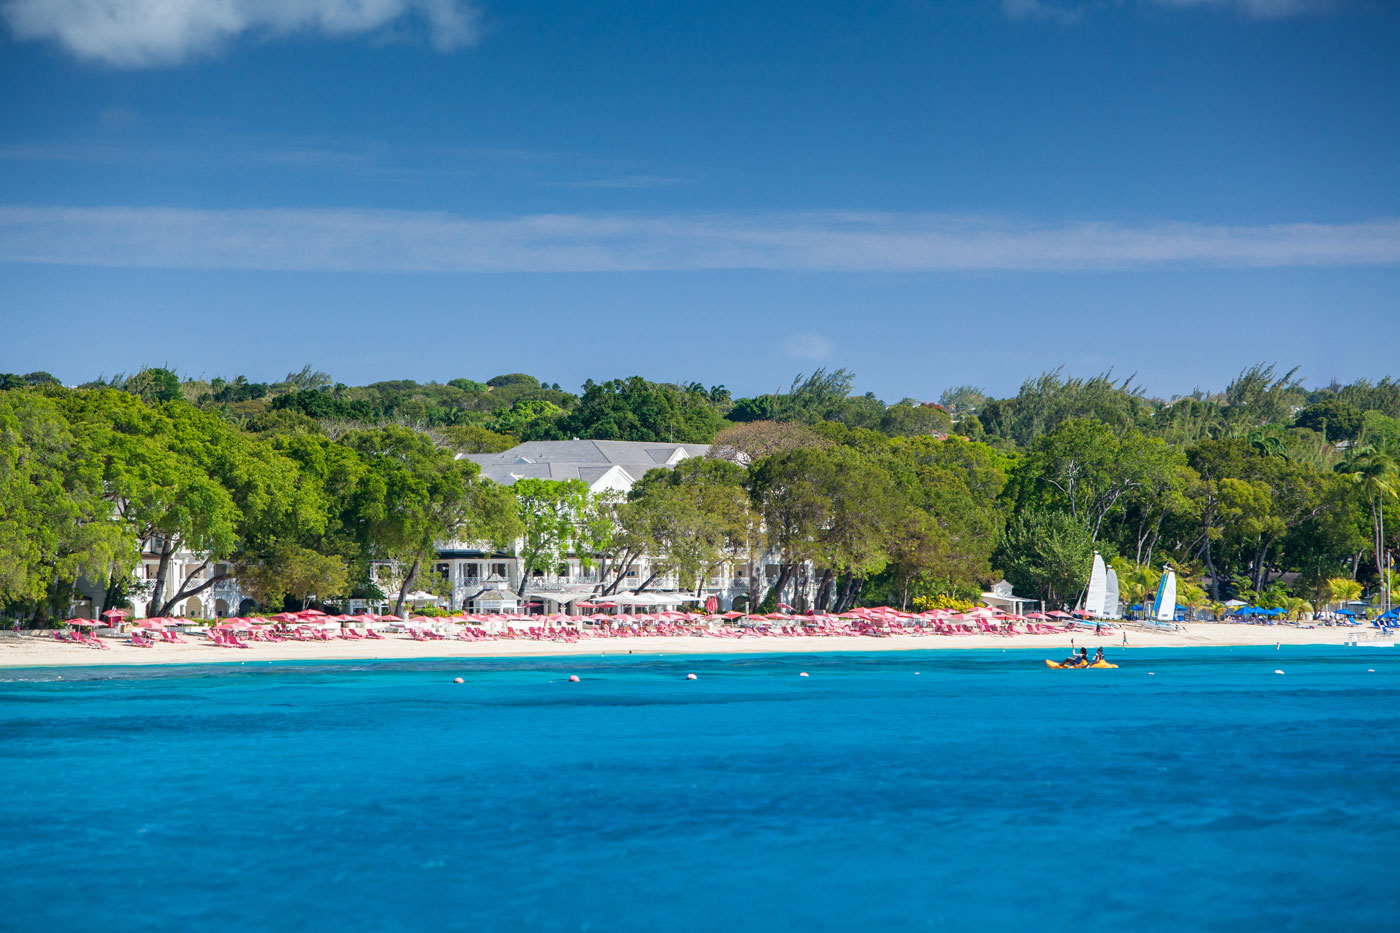 Location Sandy Lane Barbados Luxury Resorts